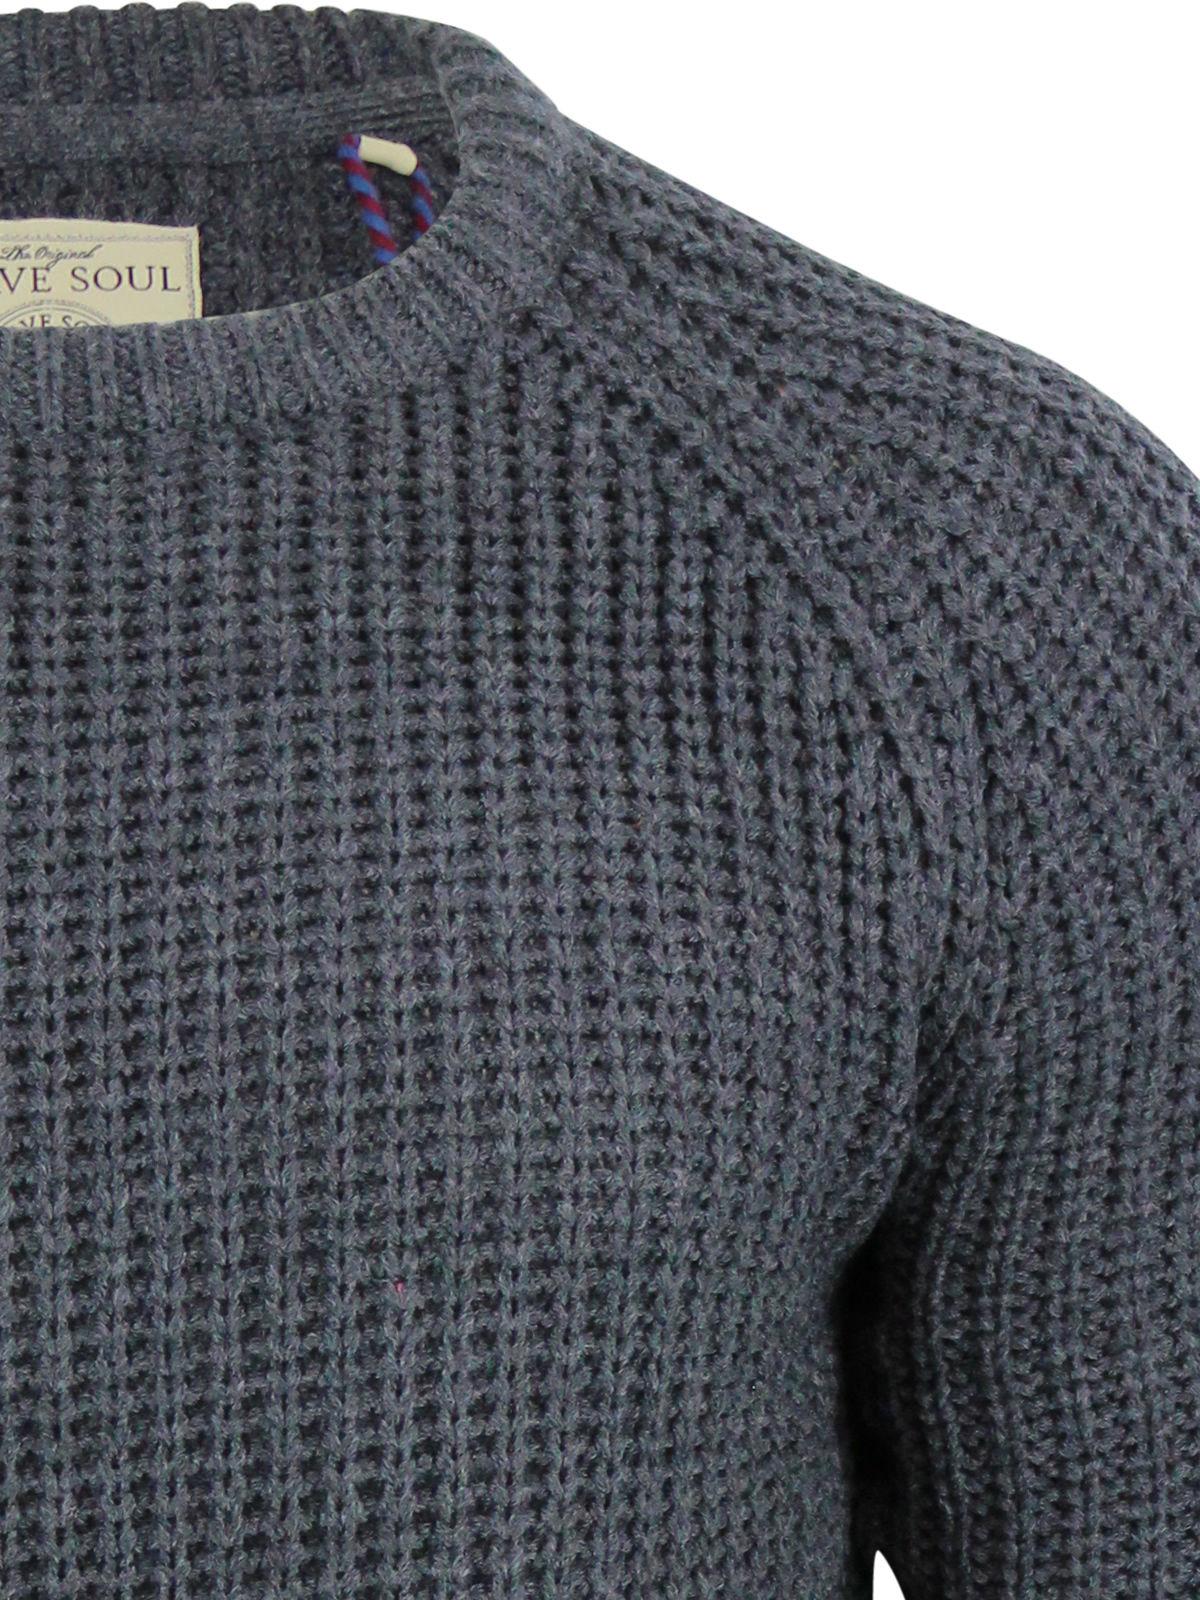 Knitting Pattern Mens Crew Neck Jumper : Mens Jumper Brave Soul Konstantin Fisherman Knit Crew Neck Raglan Sweater eBay